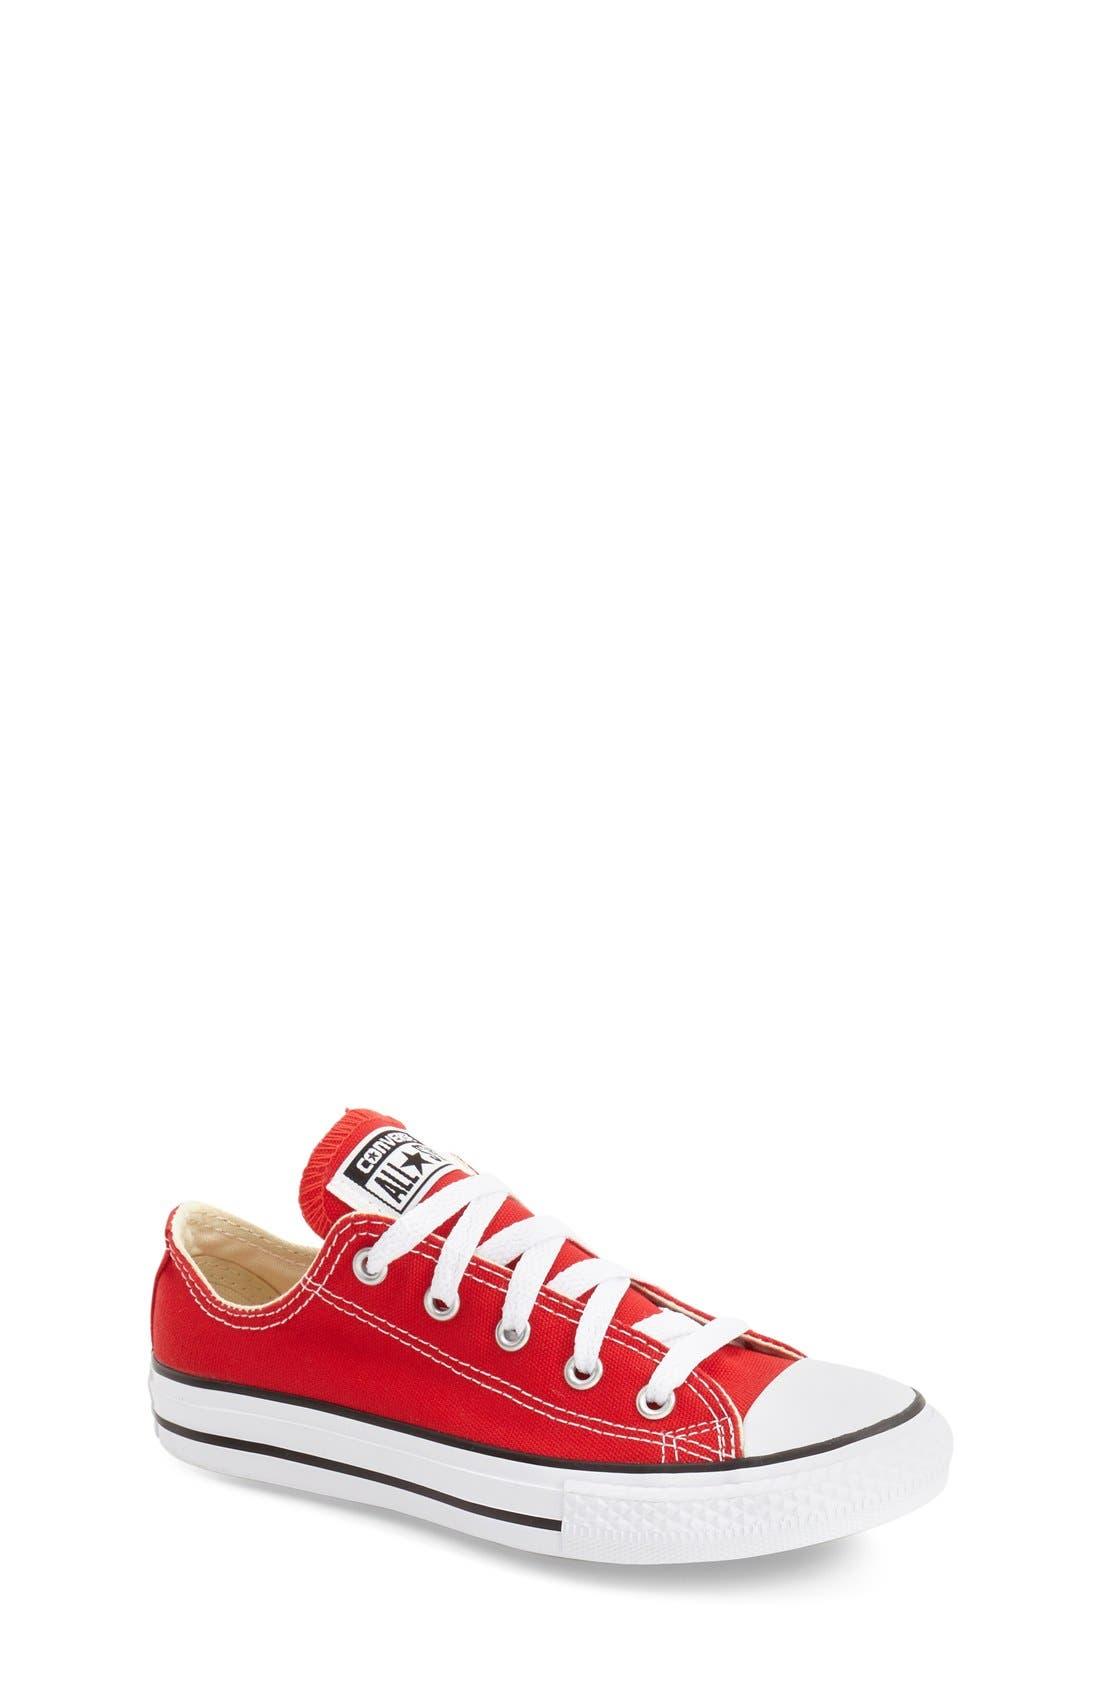 727d0f0e3046 Kids  Shoes